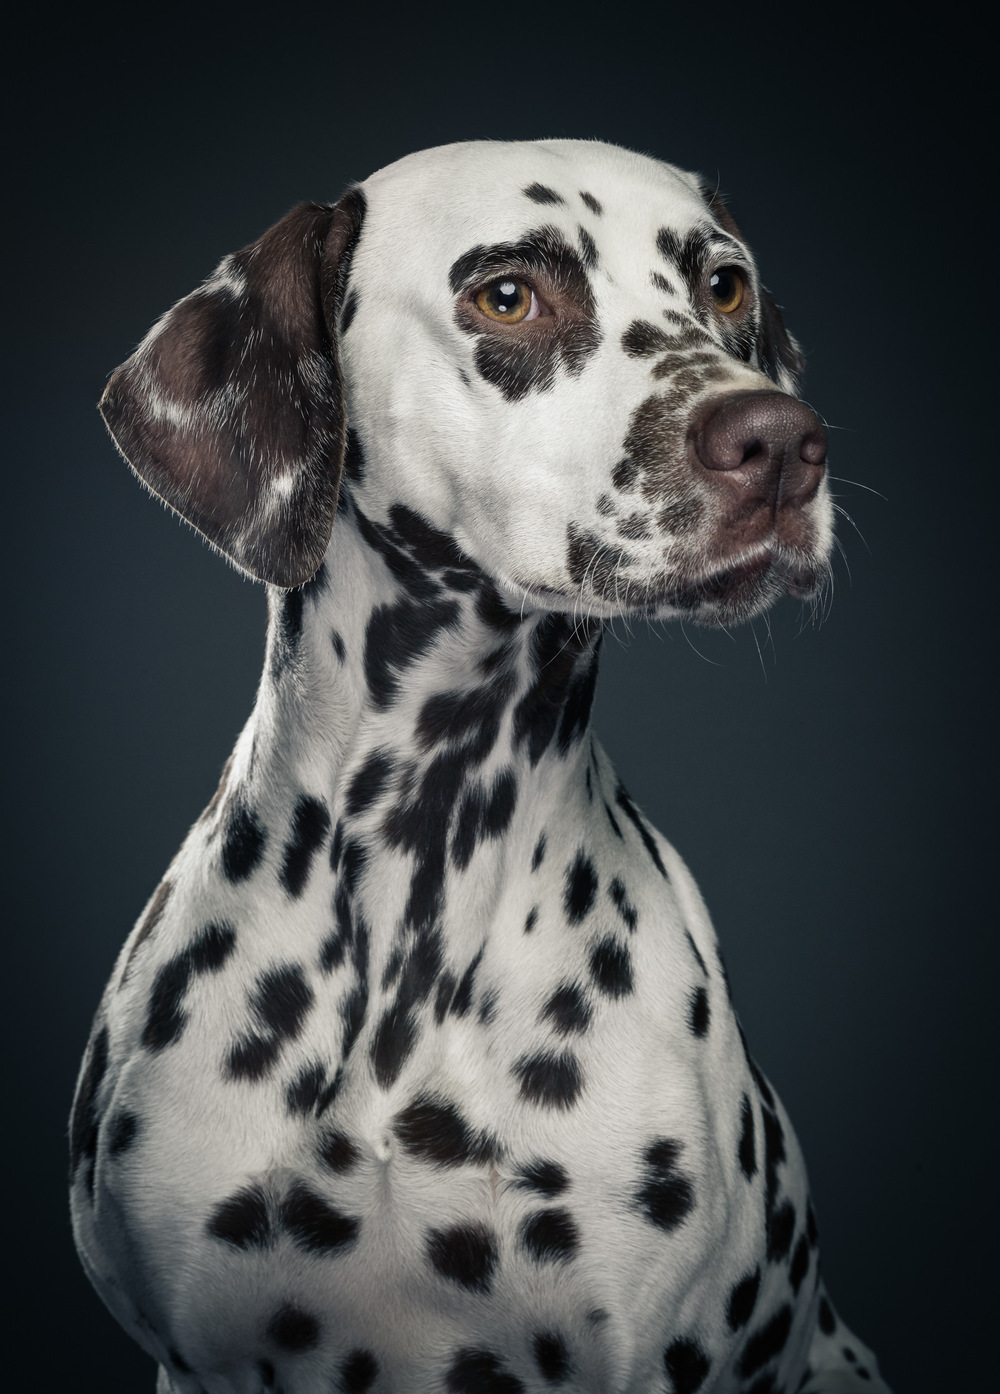 studio-dogs-klausdyba-8.jpg